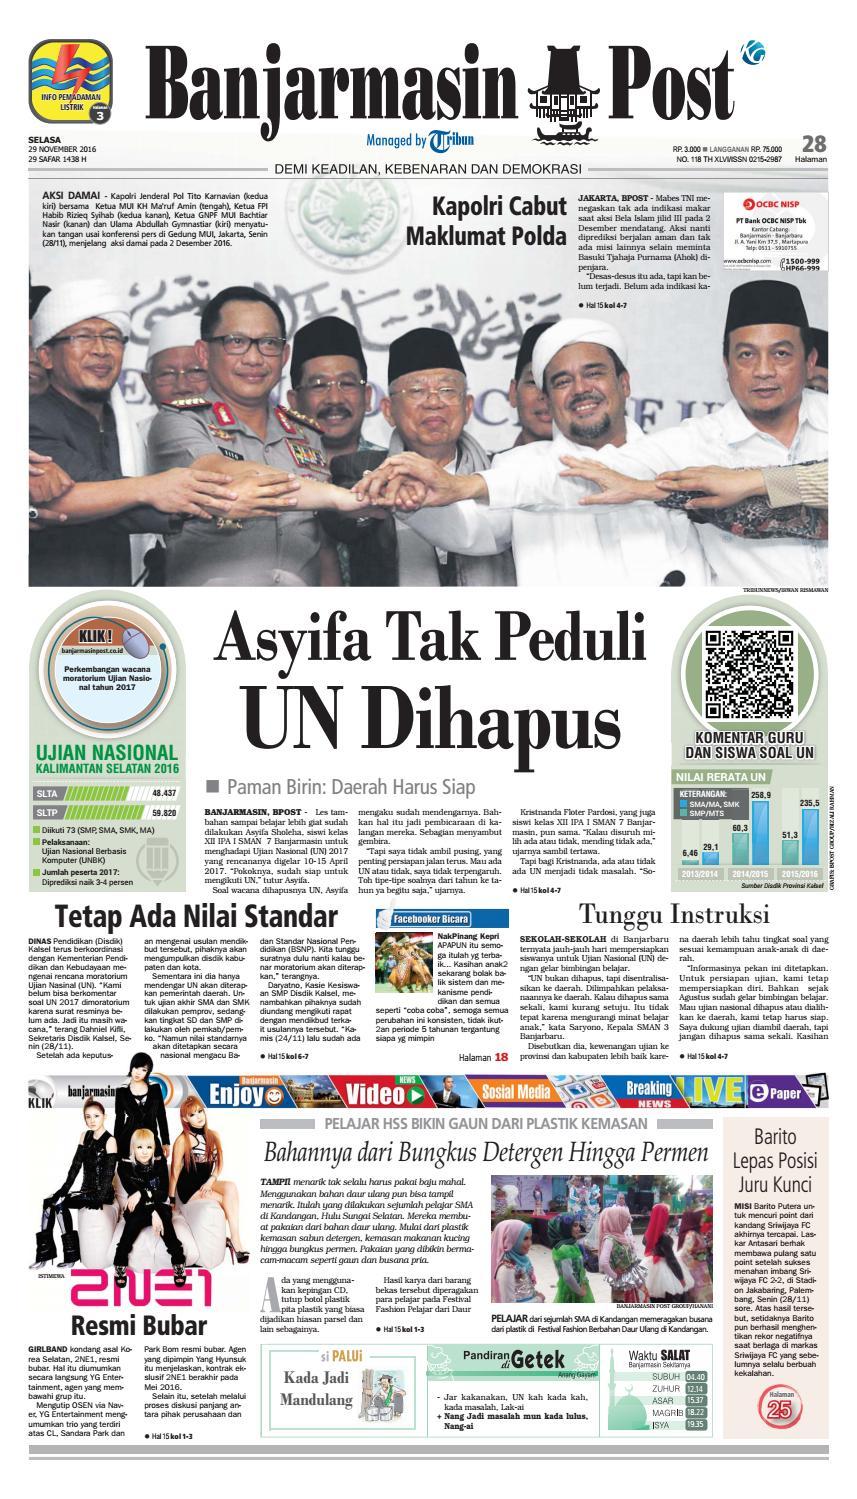 Bp20161129 By Banjarmasin Post Issuu Produk Umkm Bumn Lapis Surabaya Panjang Hj Enong